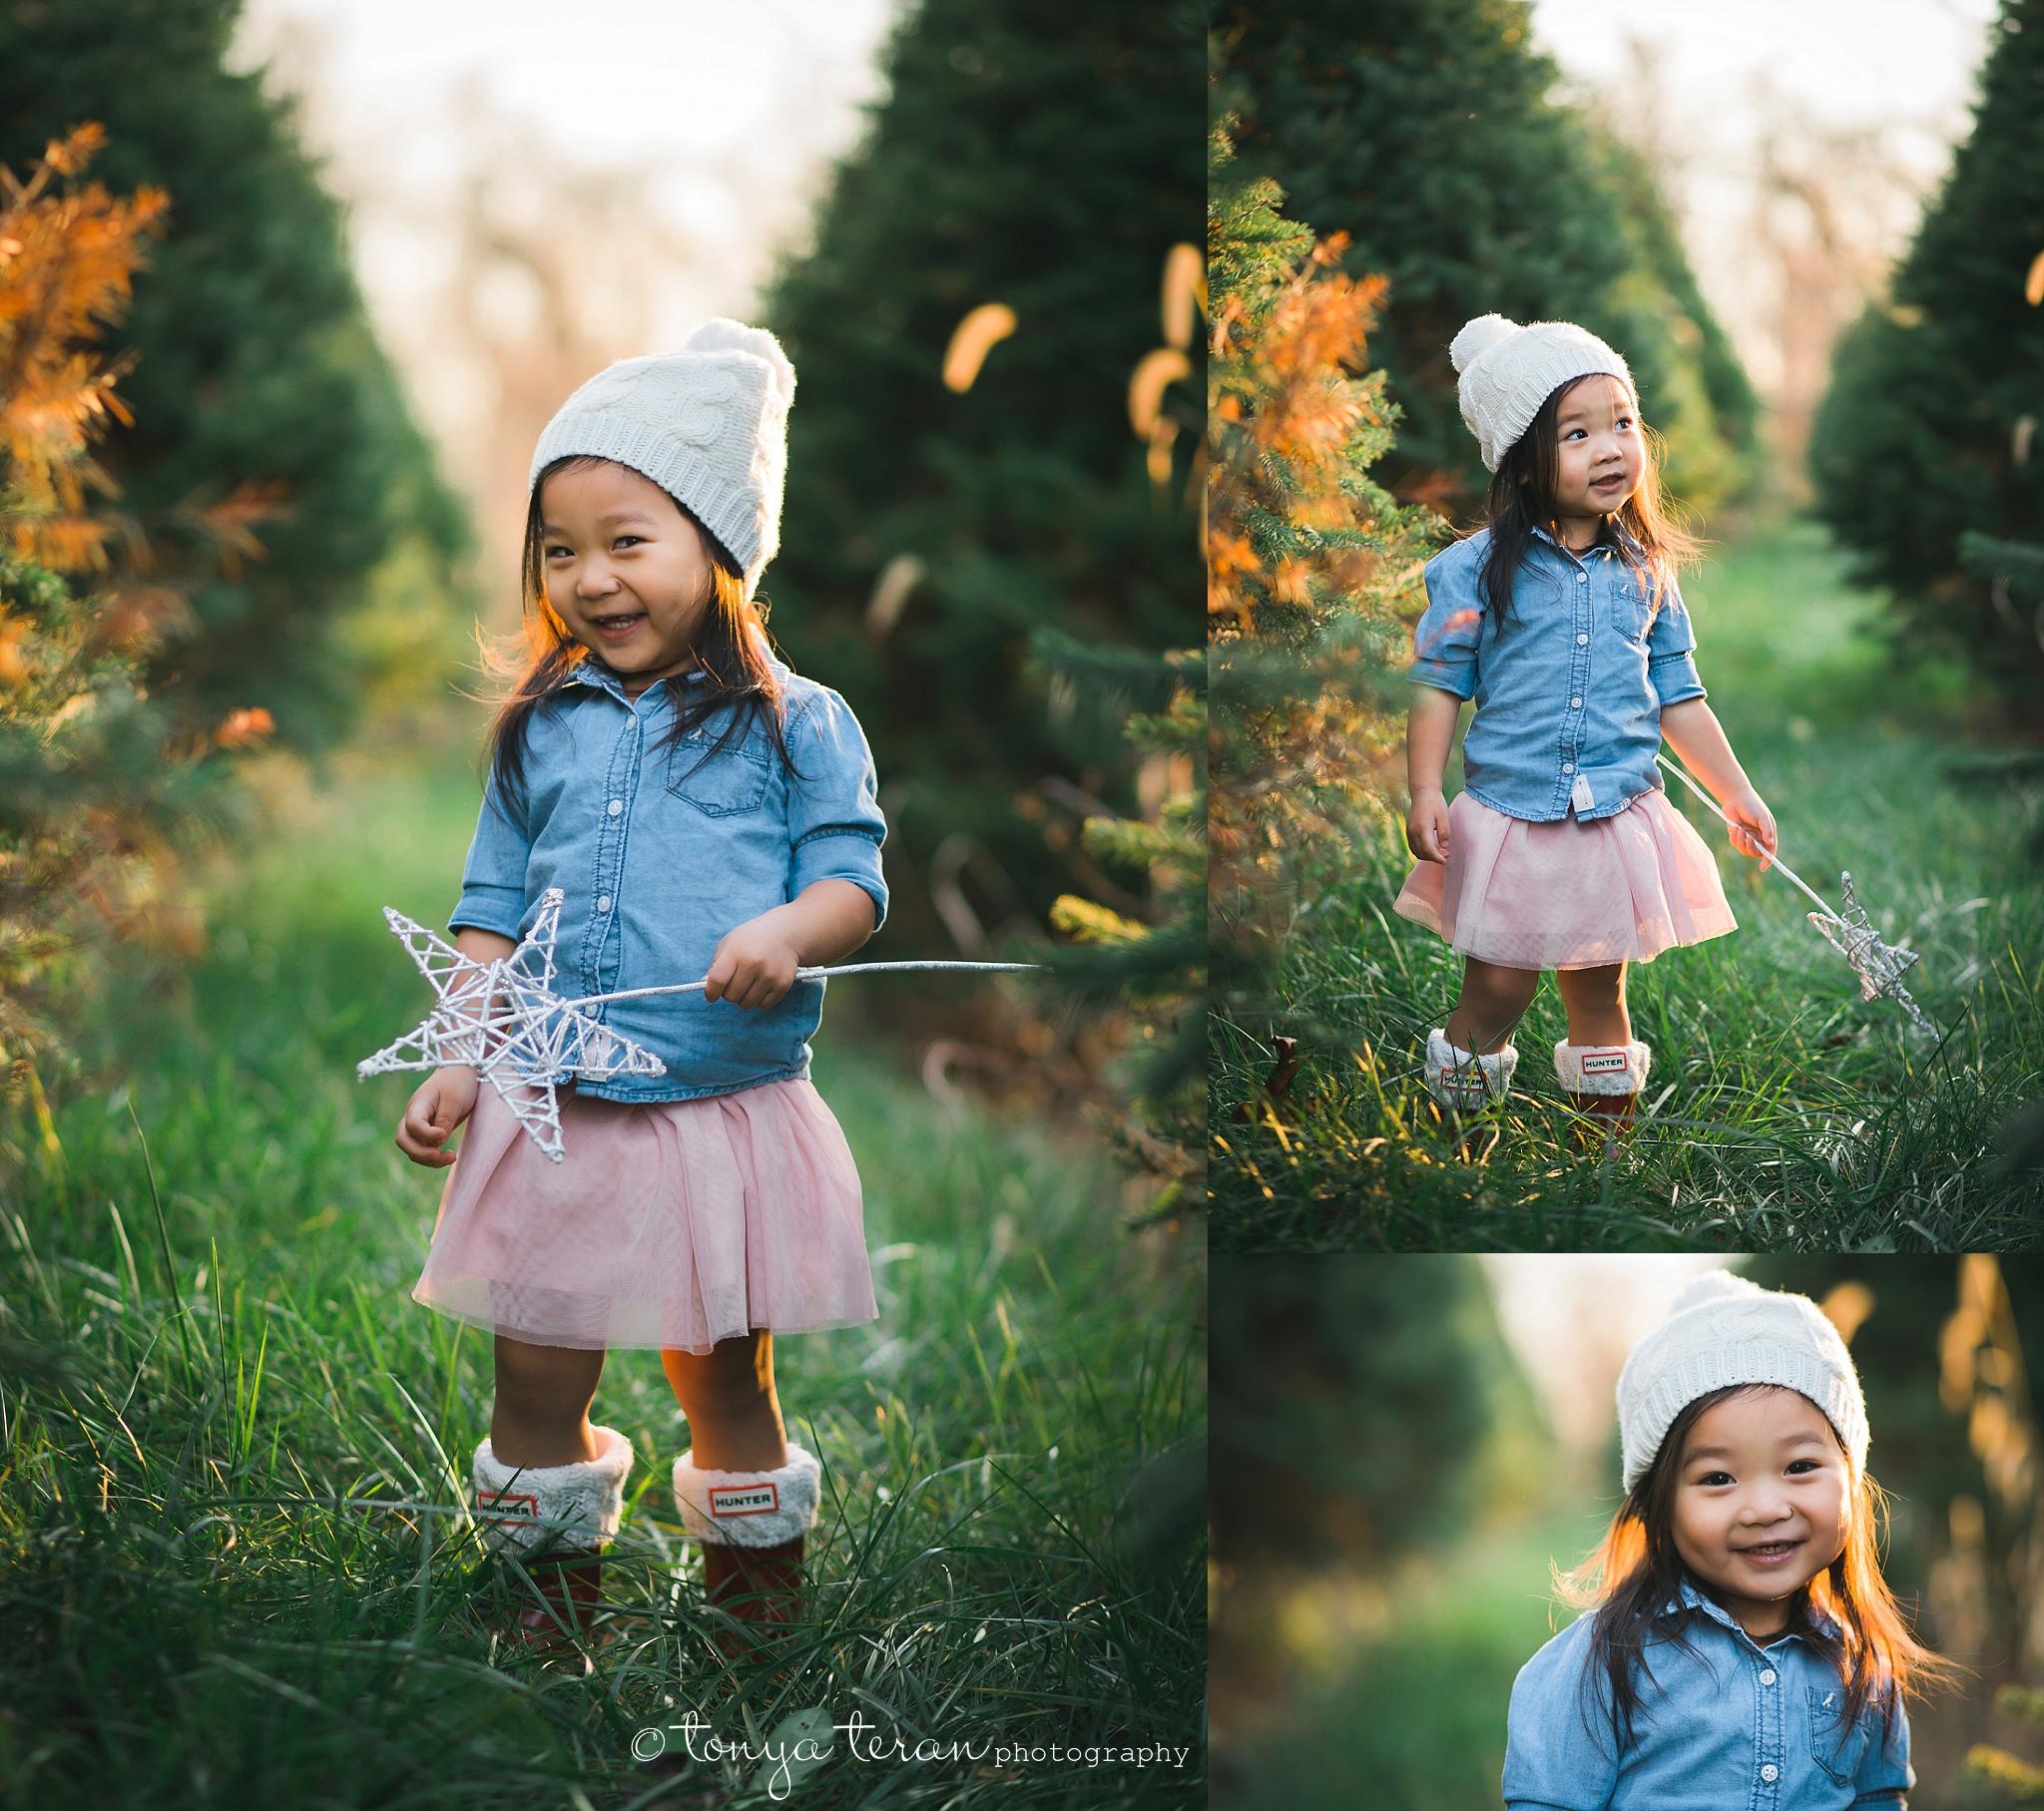 Christmas Tree Farm Holiday Mini Sessions | Tonya Teran Photography, Germantown, MD Newborn, Baby, and Family Photographer